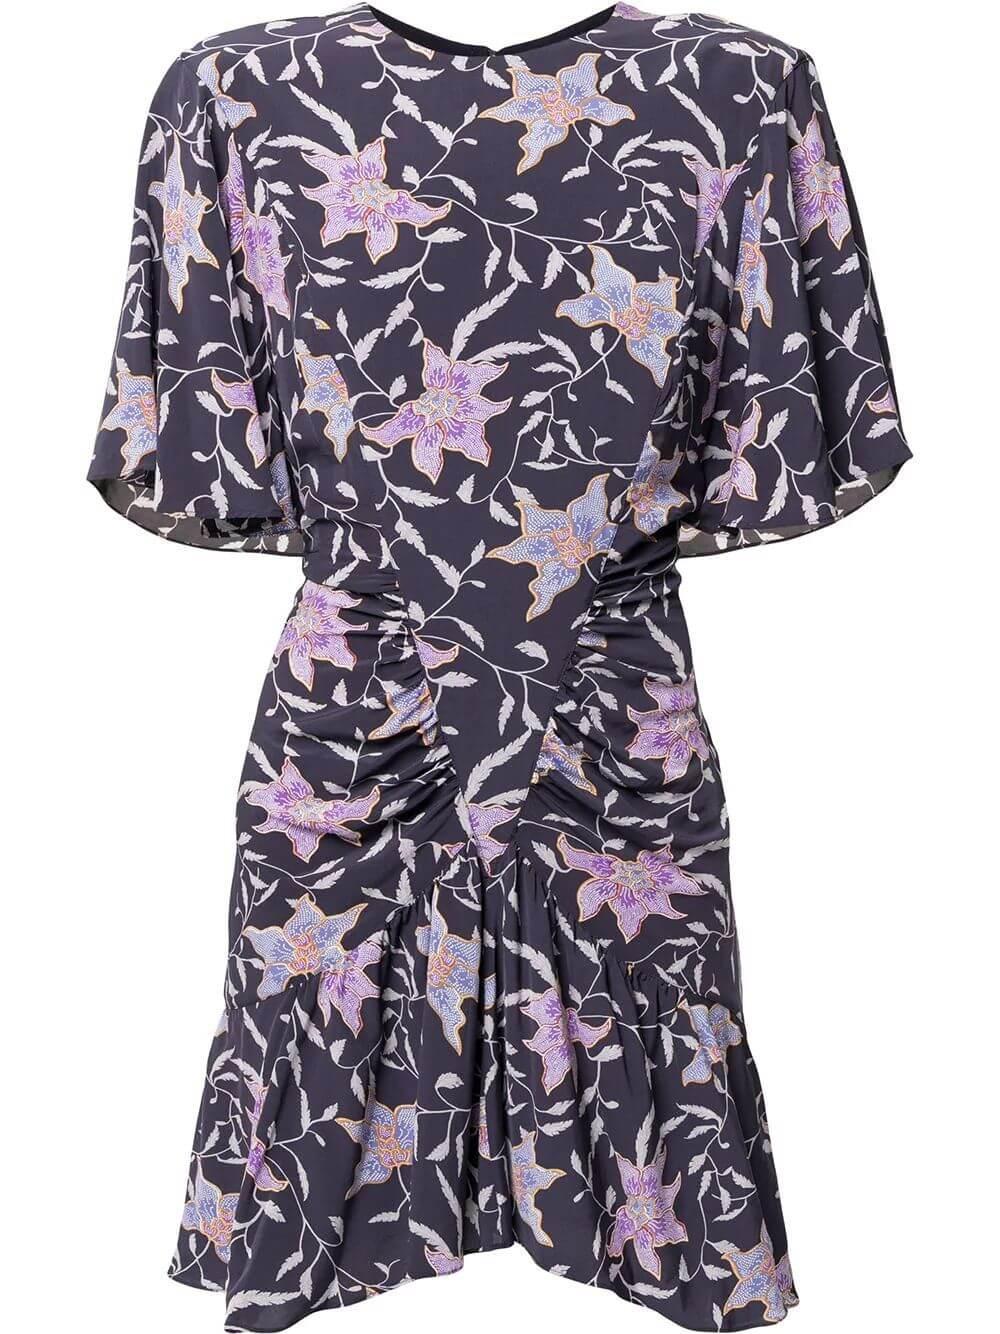 Osias Printed Dress